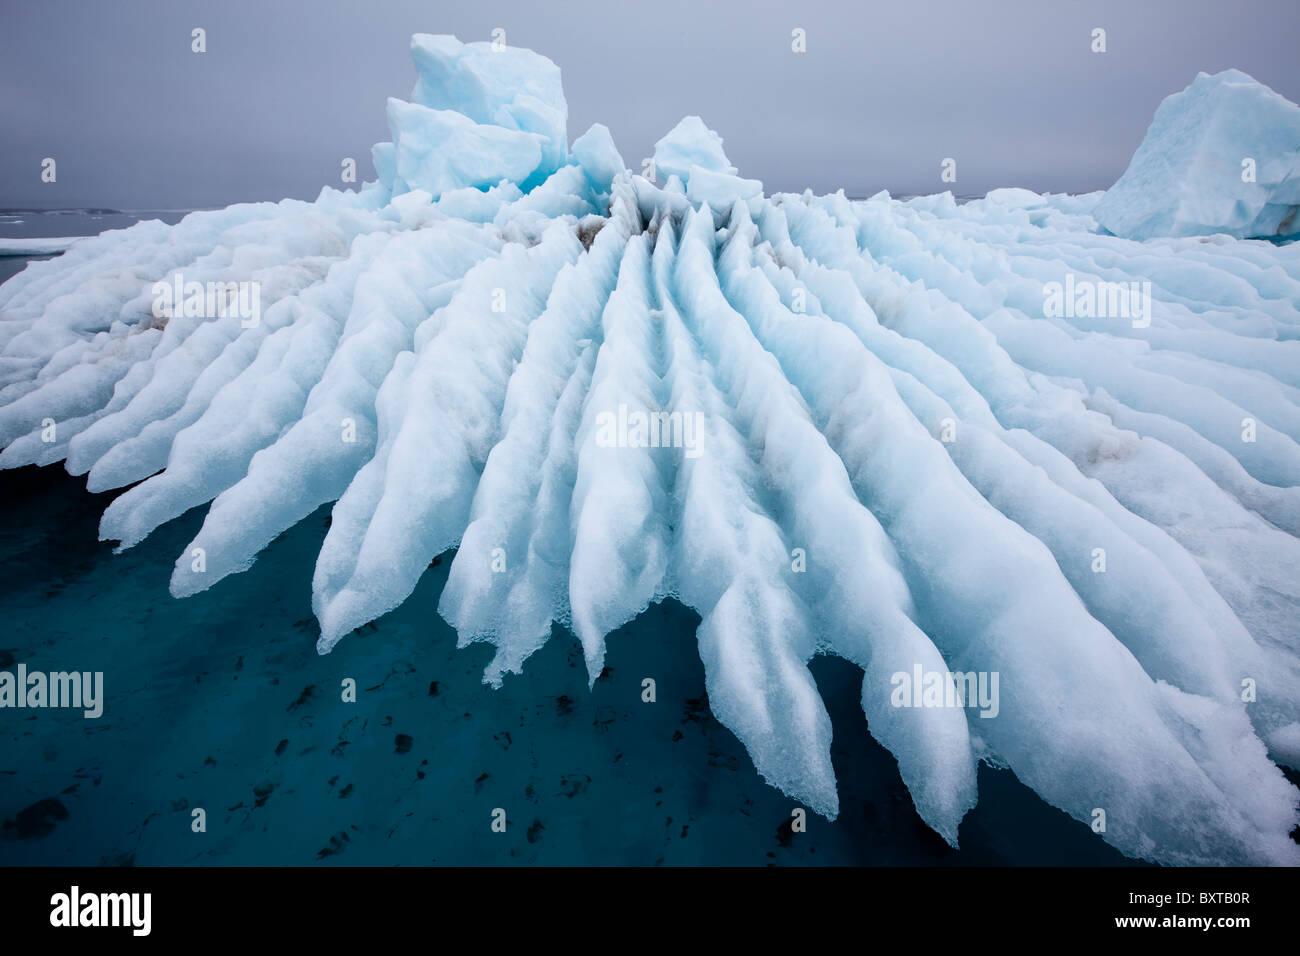 Norway, Svalbard, Nordaustlandet, Jagged patterns in melting sea ice in fog along Wahlberg Island - Stock Image